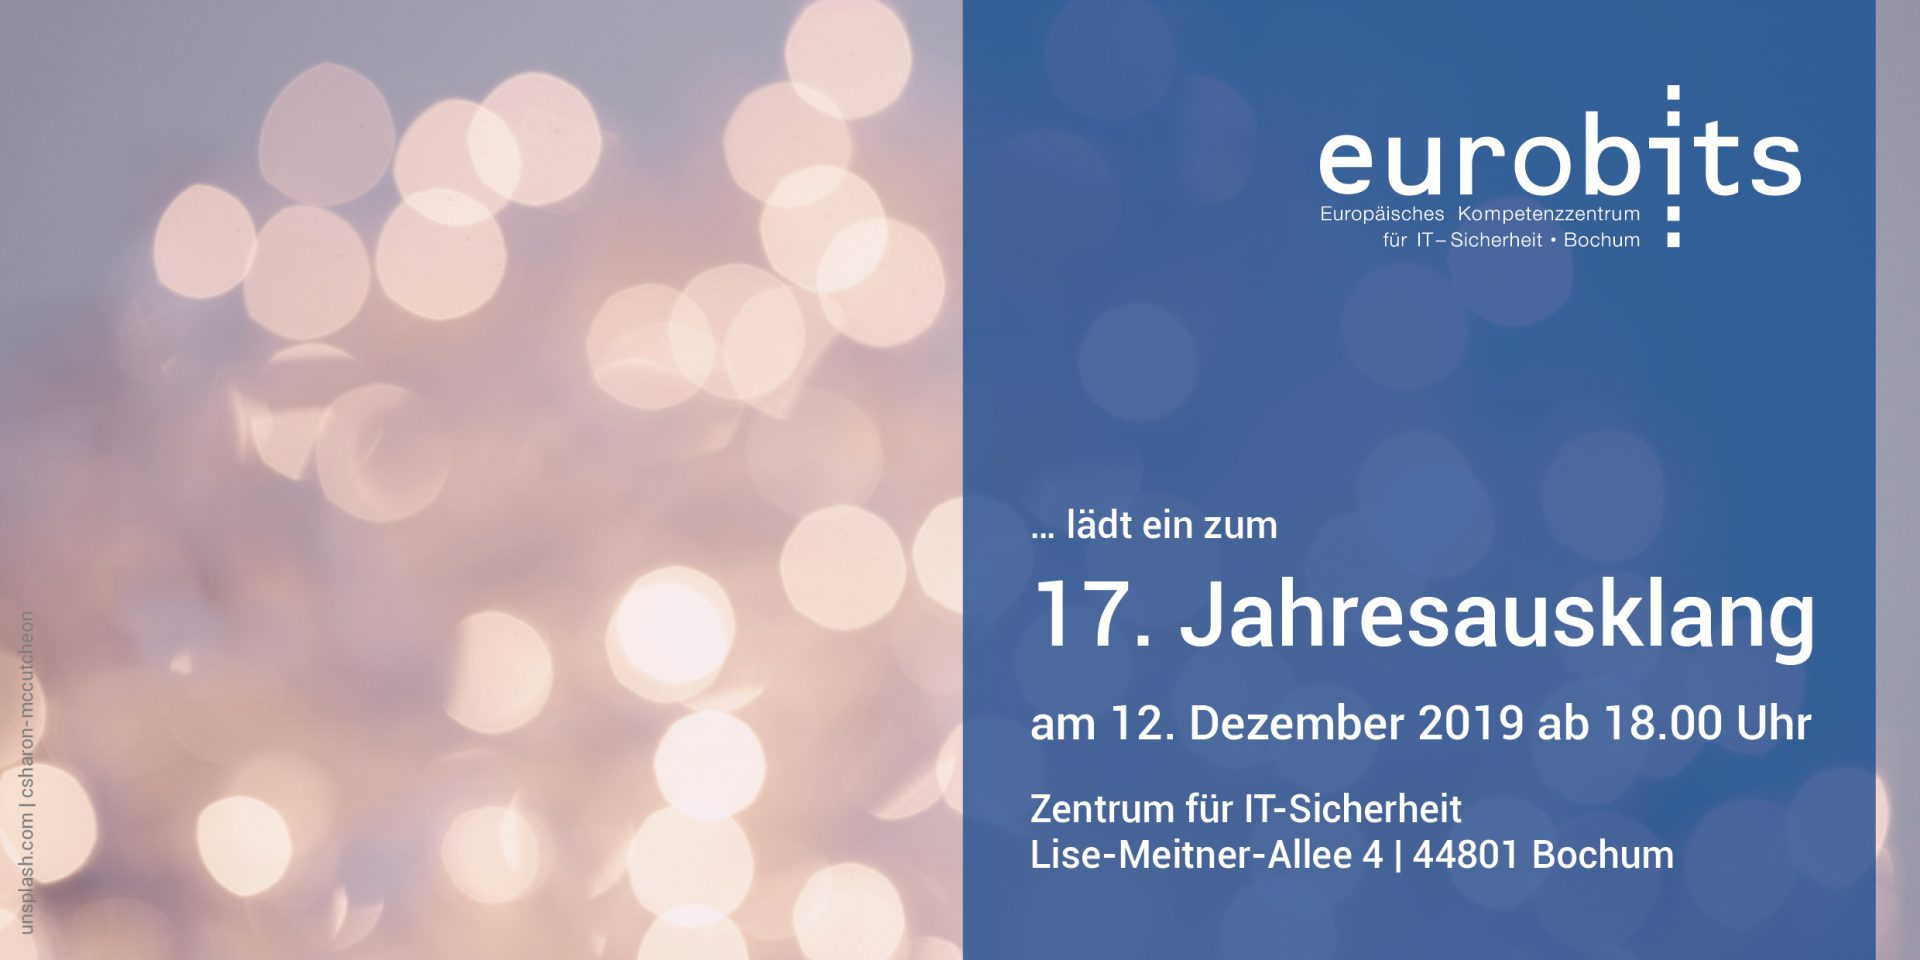 Eurobits Jahresausklang 2019